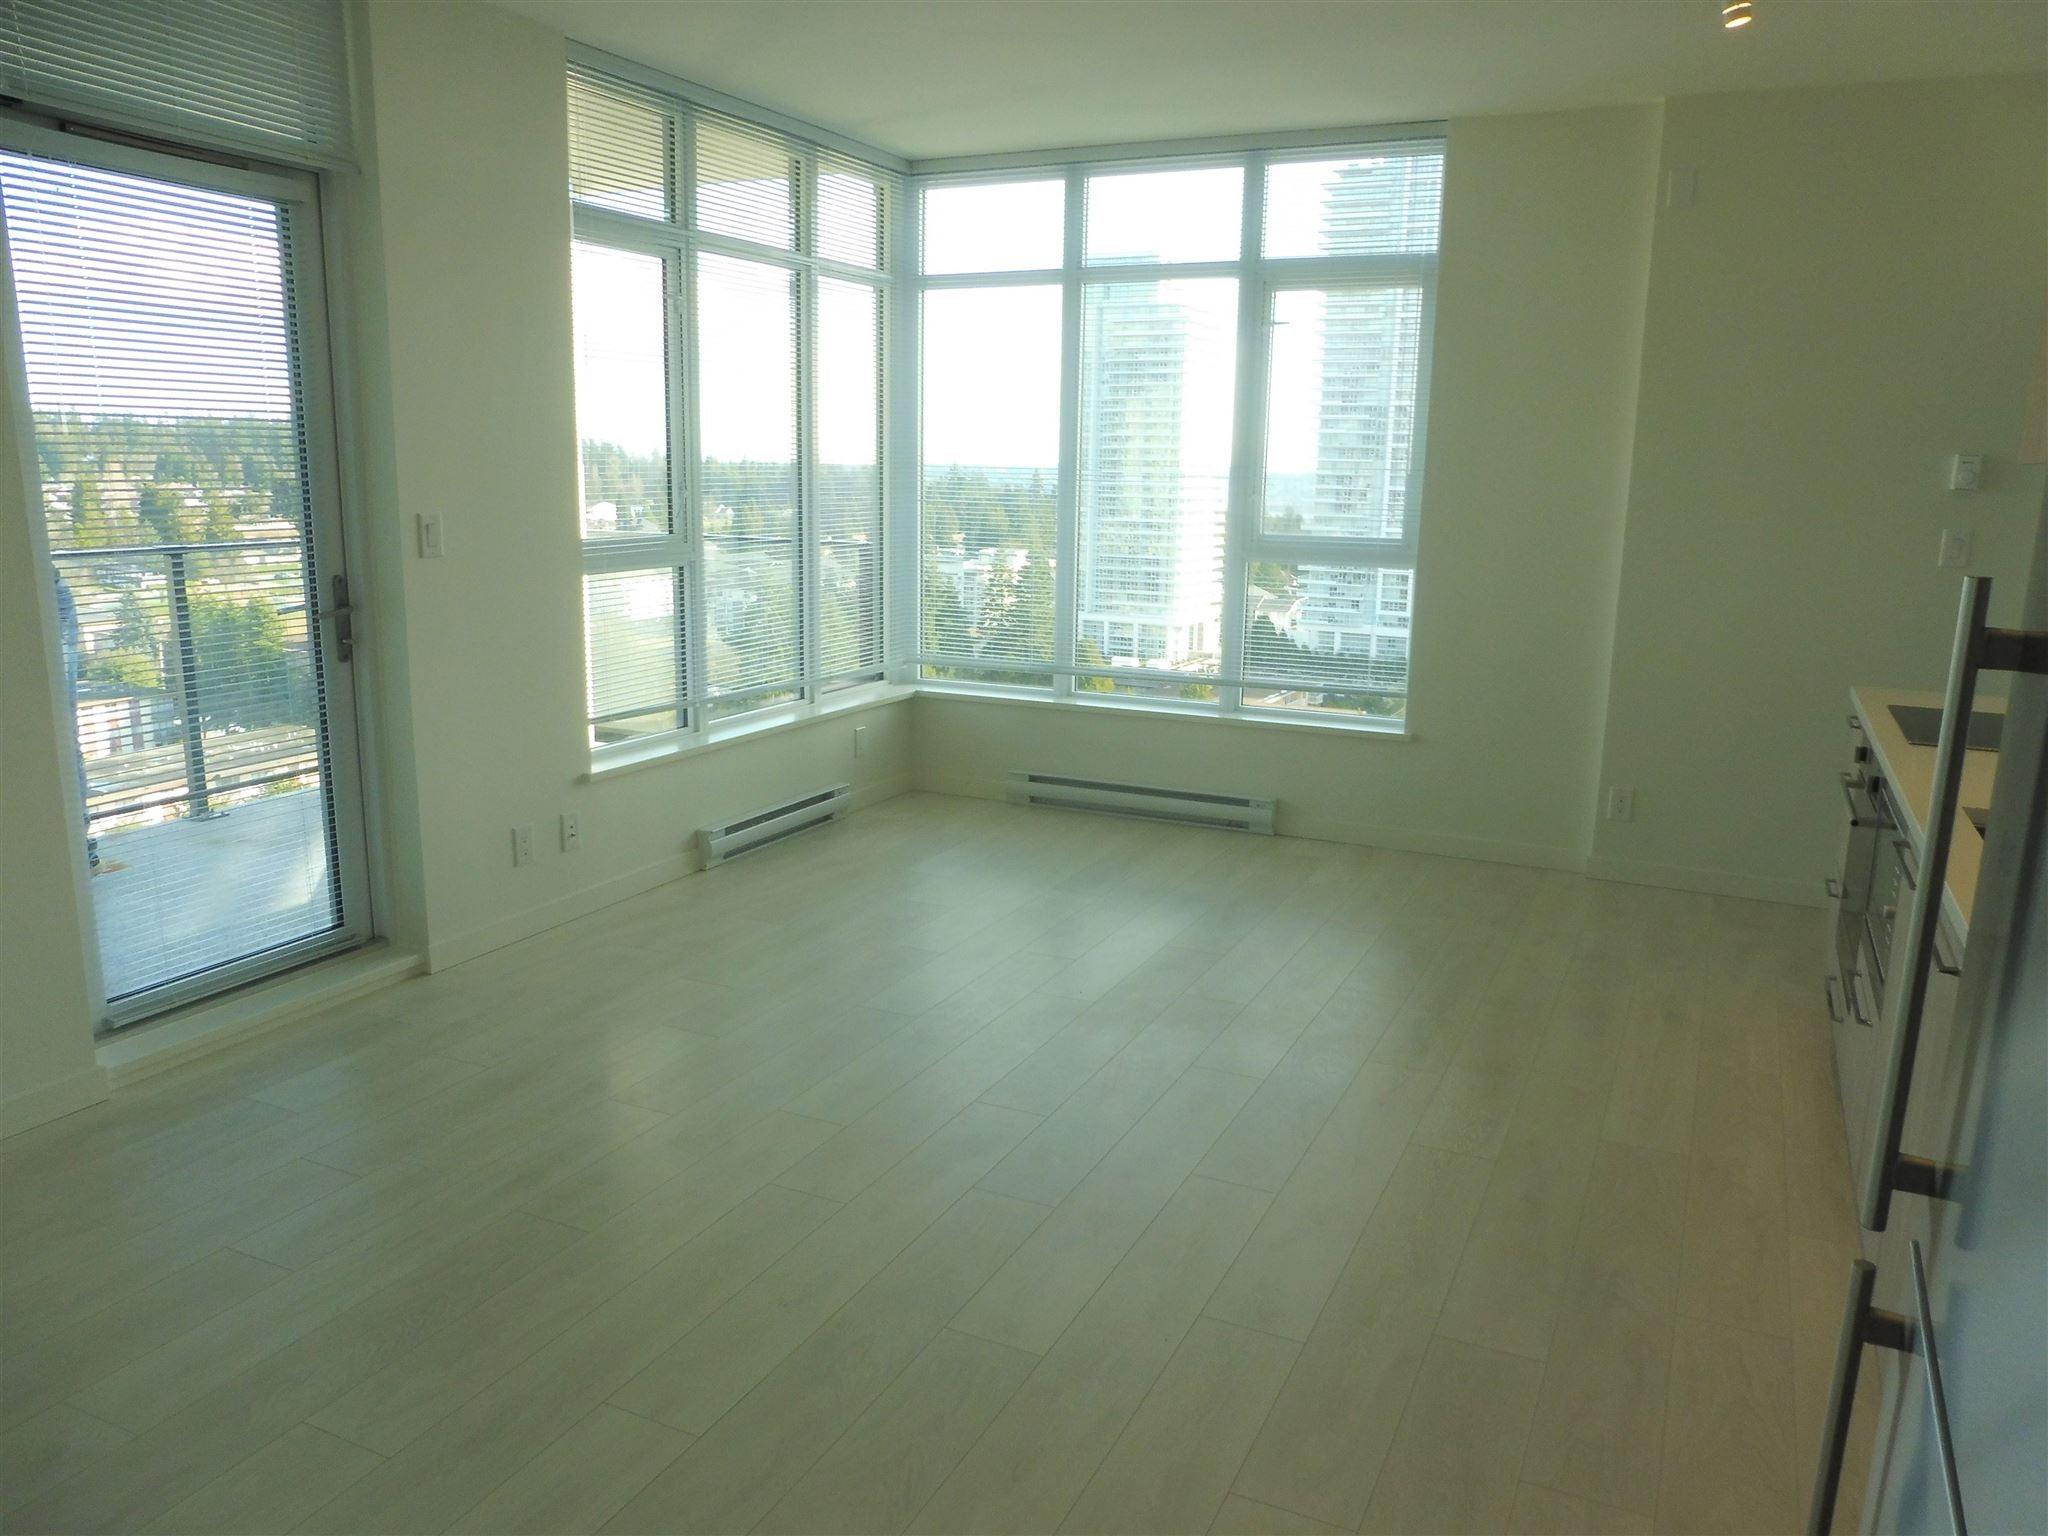 1409 691 NORTH ROAD - Coquitlam West Apartment/Condo for sale, 2 Bedrooms (R2604155) - #8